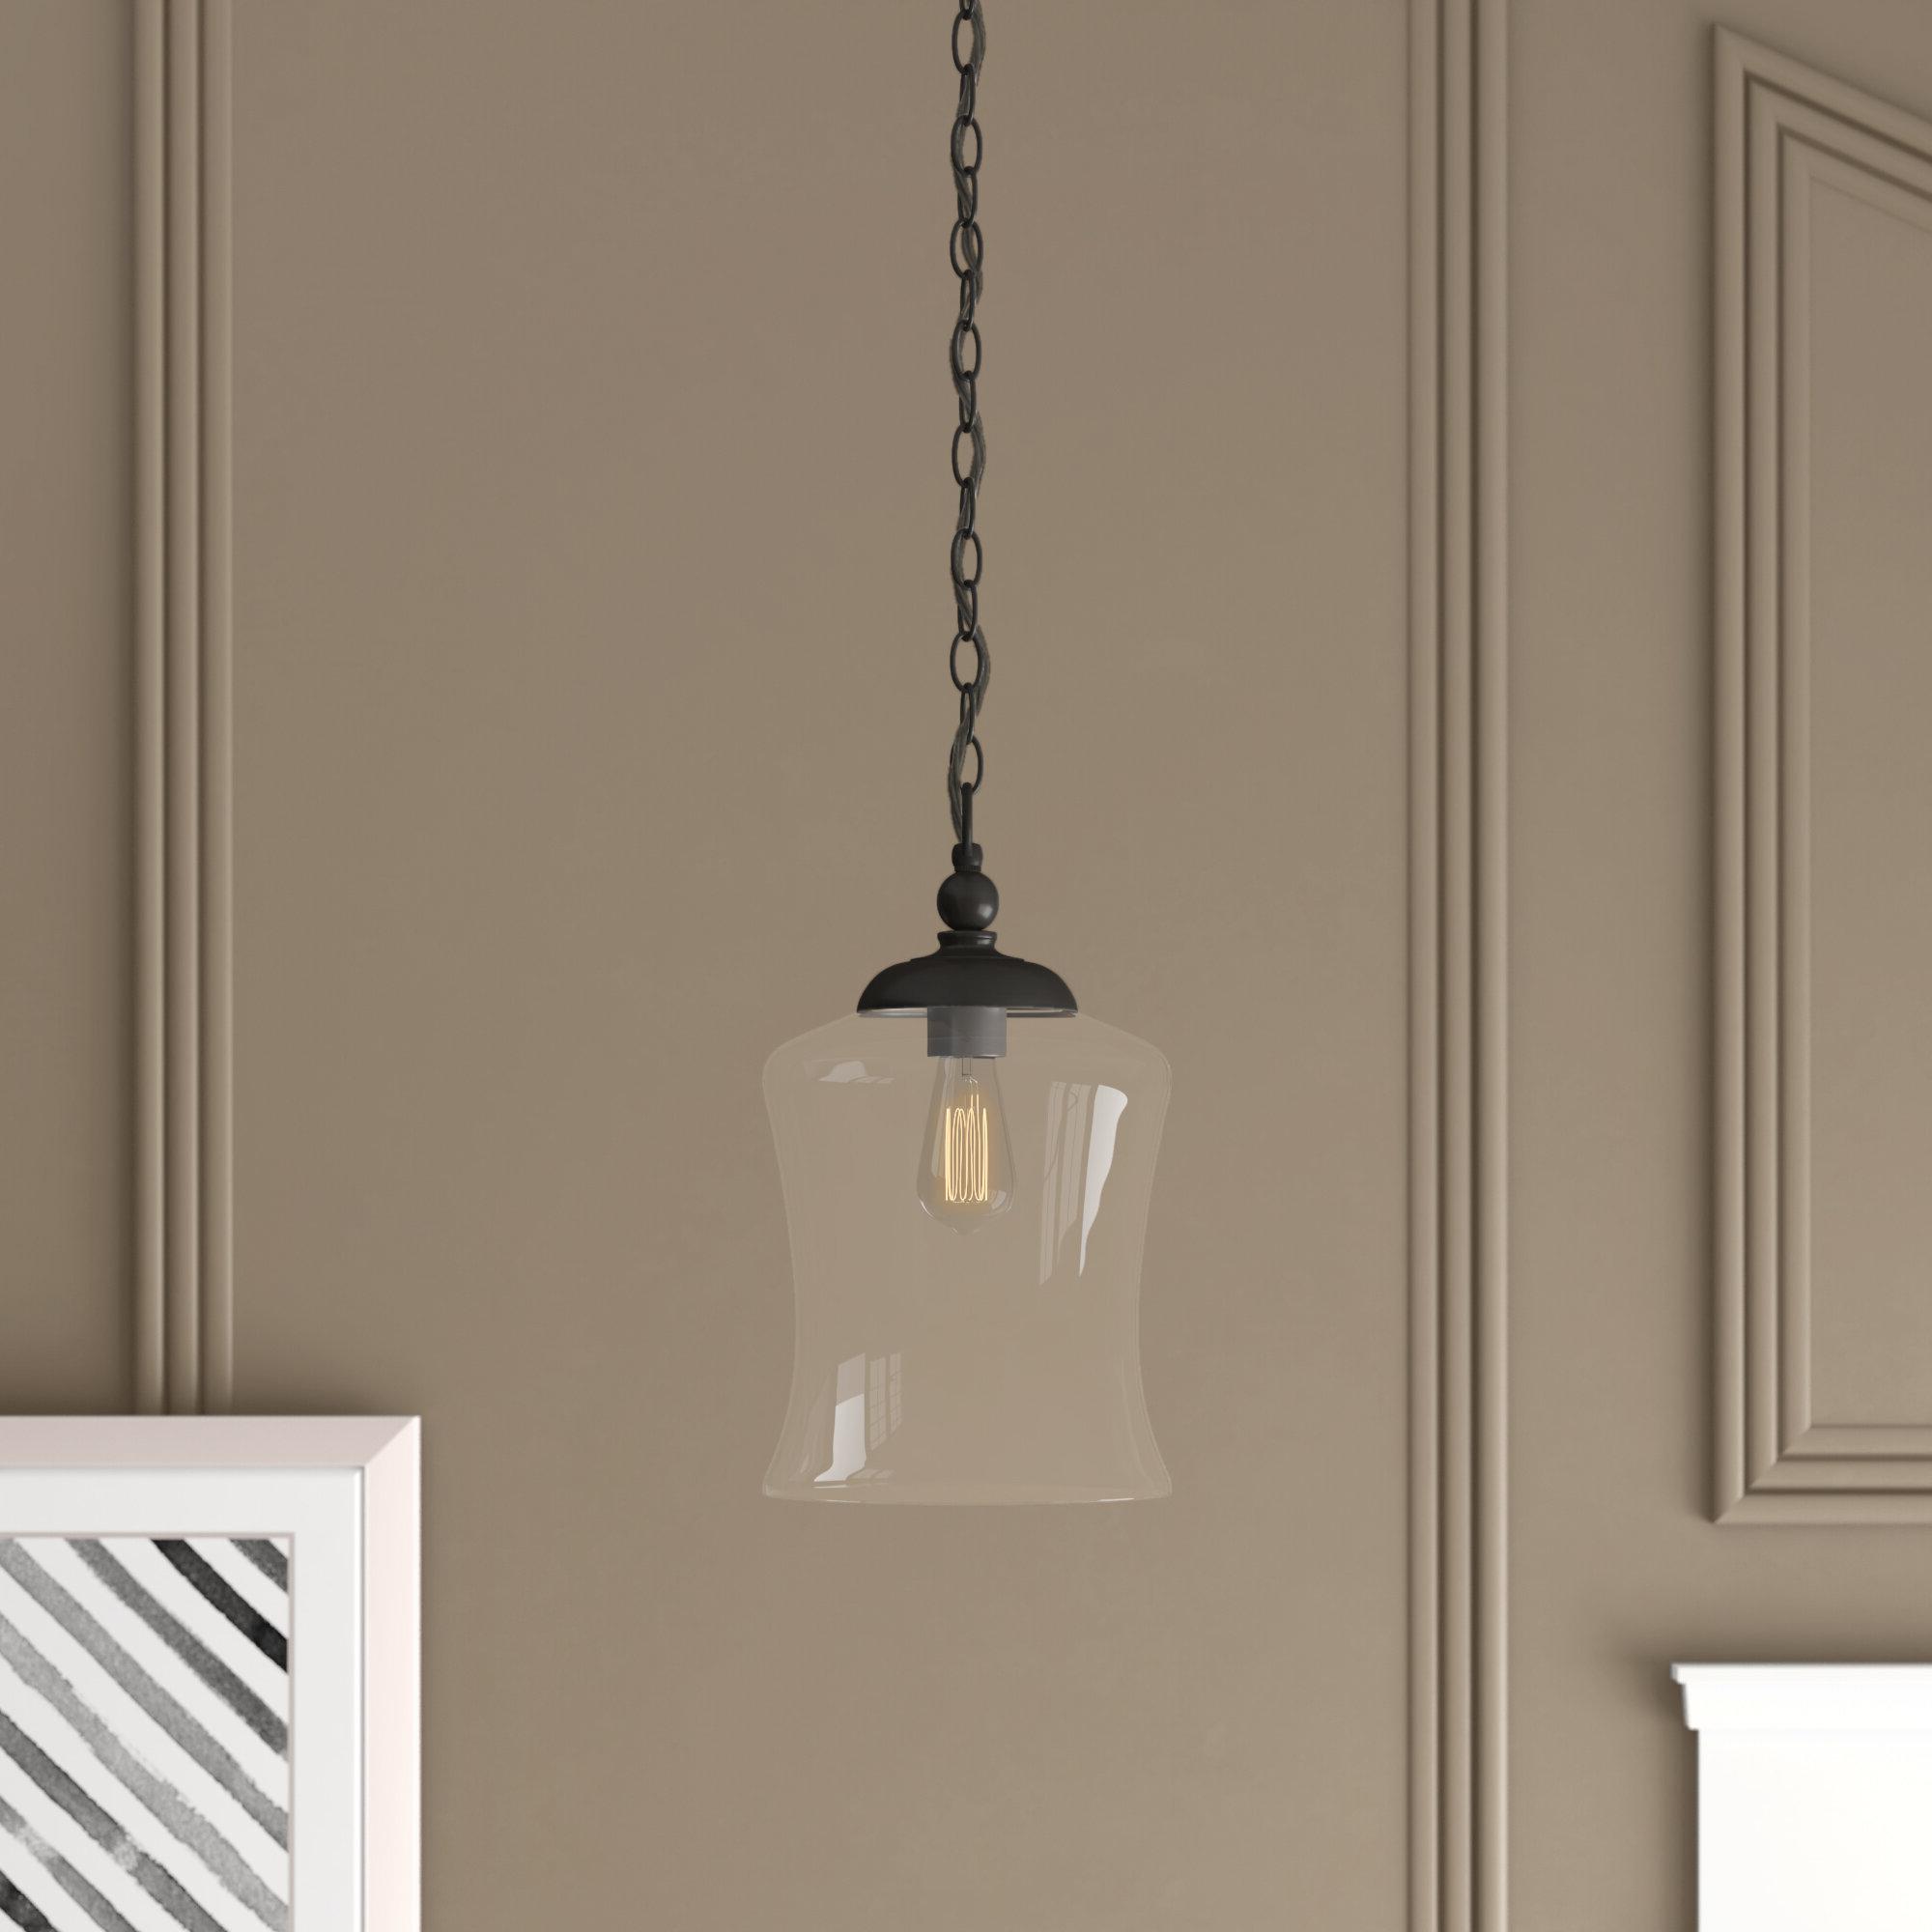 Knoxville 1 Light Single Teardrop Pendants For Recent Wentzville 1 Light Single Bell Pendant (Gallery 23 of 25)